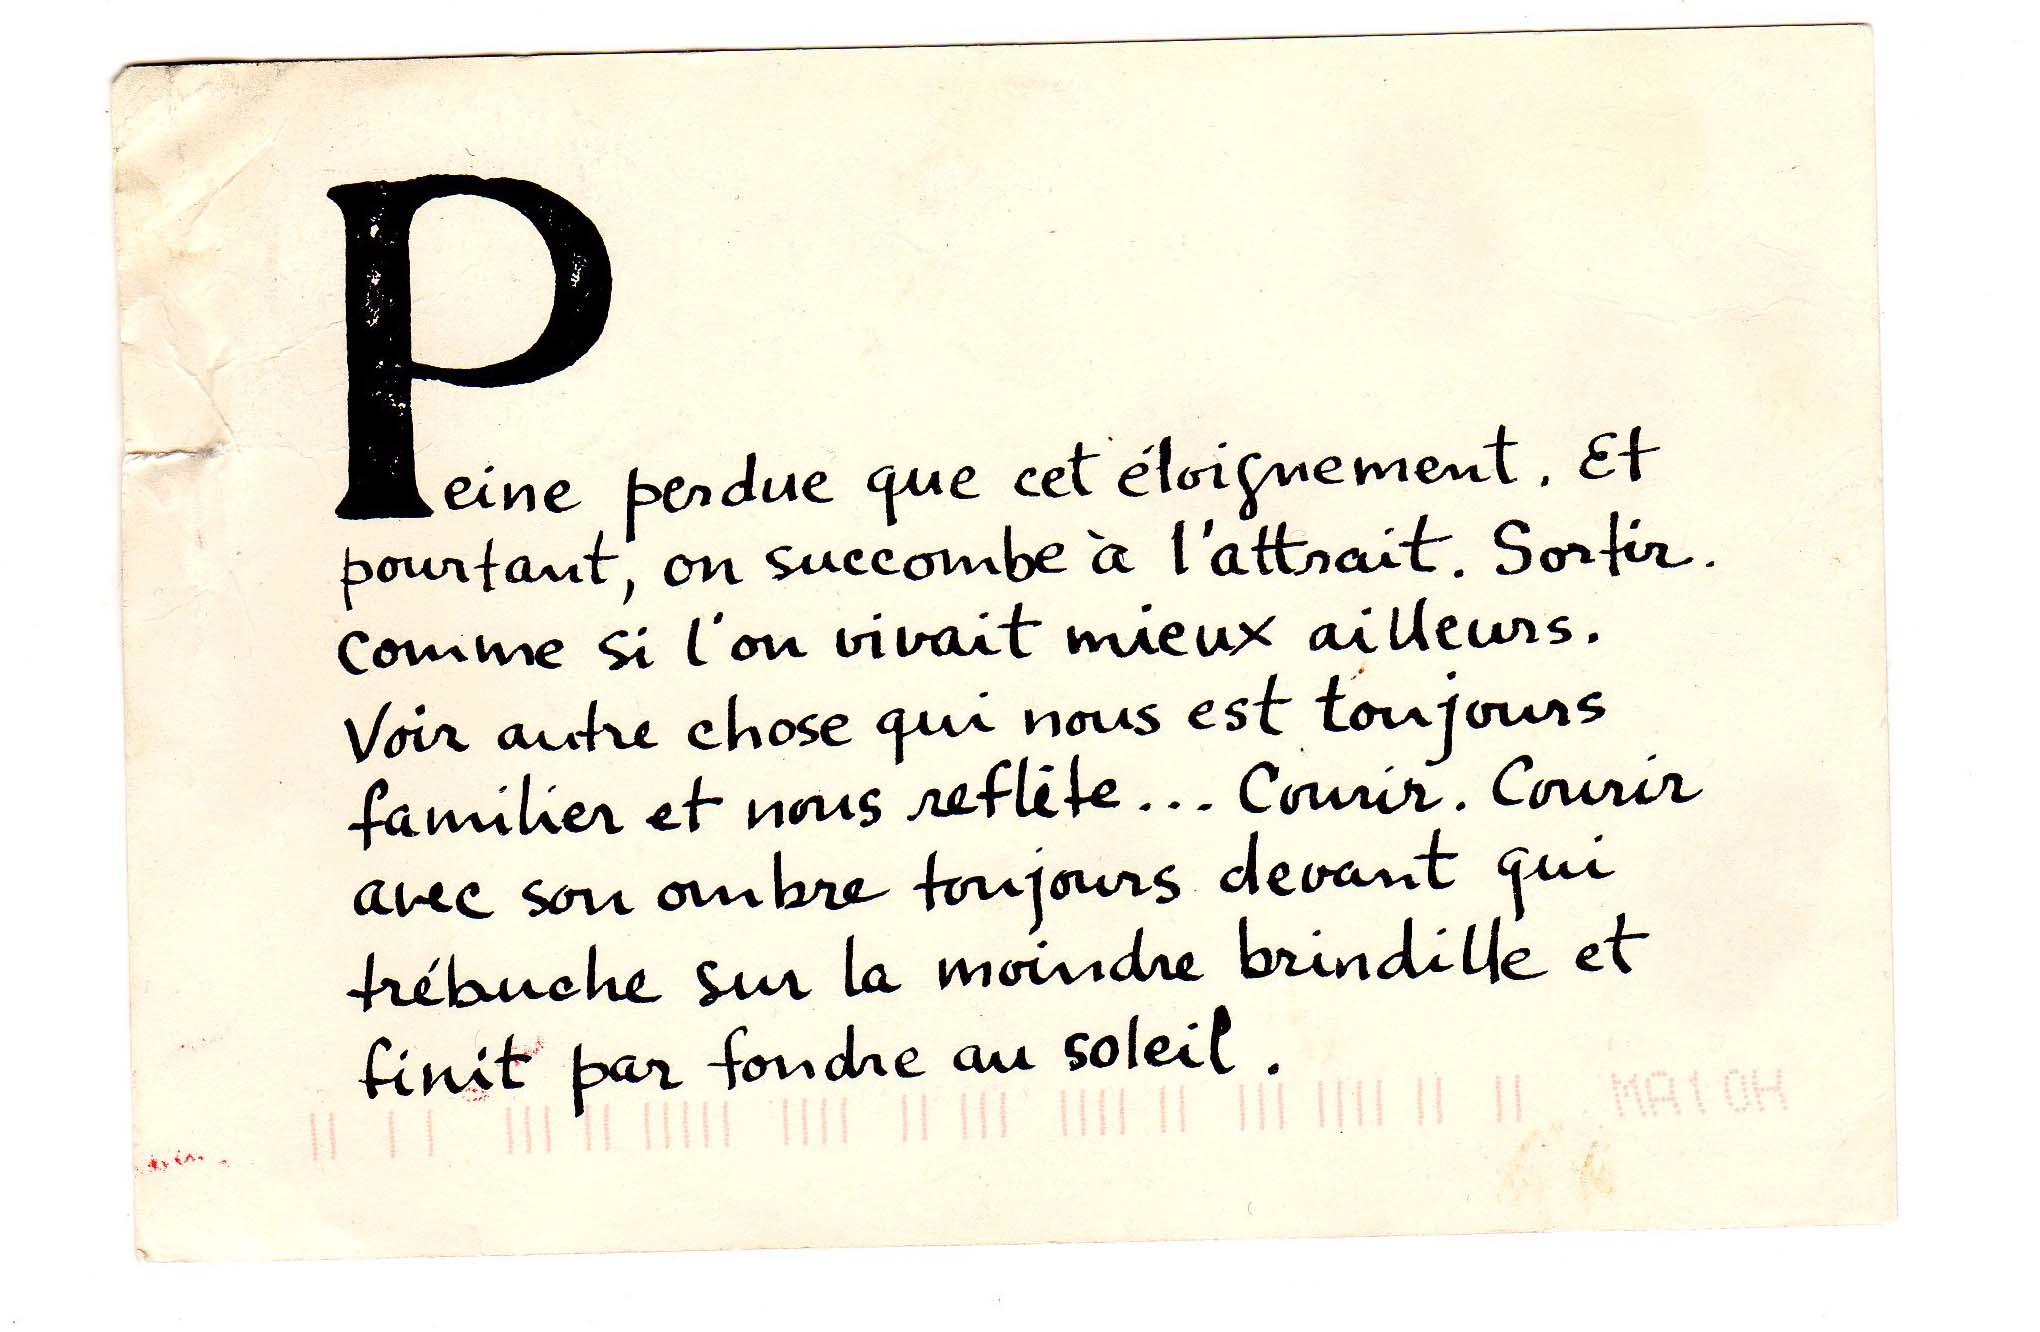 Abecedaire Du Voyage En 26 Cartes Postales Recit Nomade